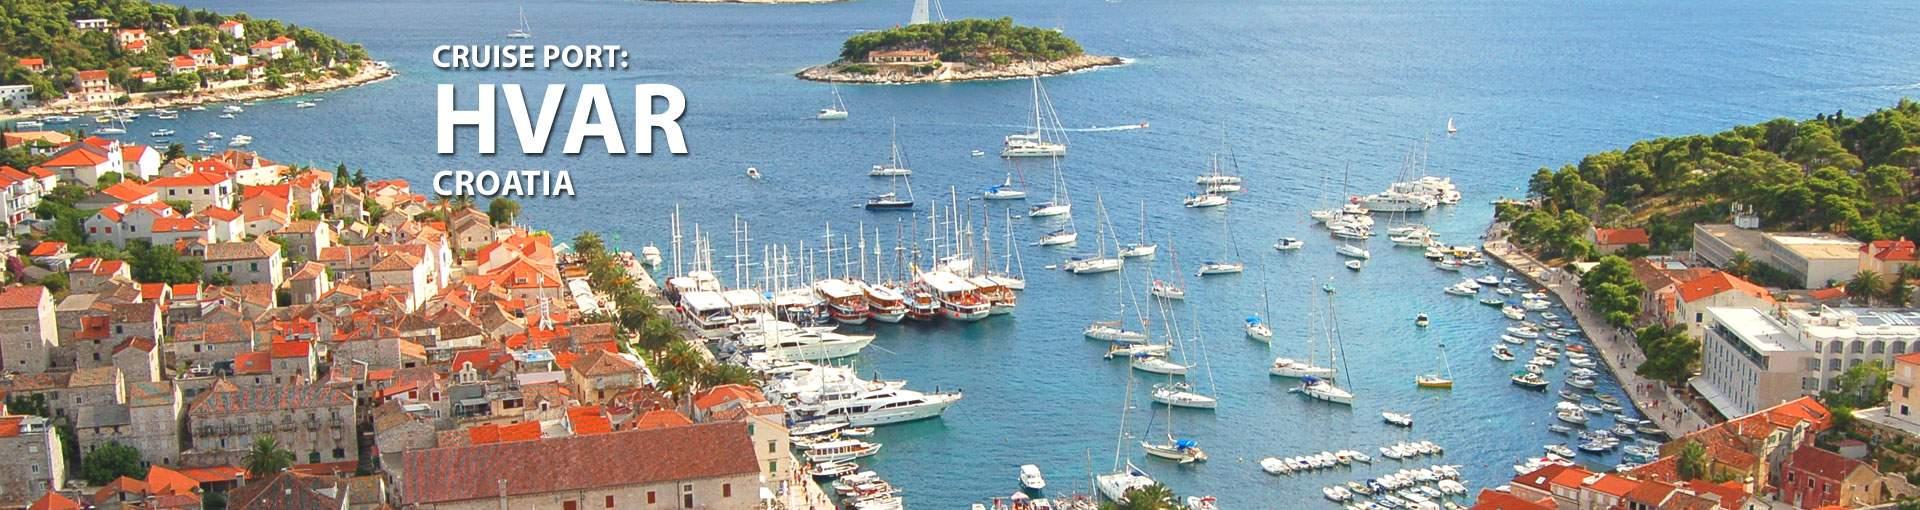 Cruises to Hvar, Croatia